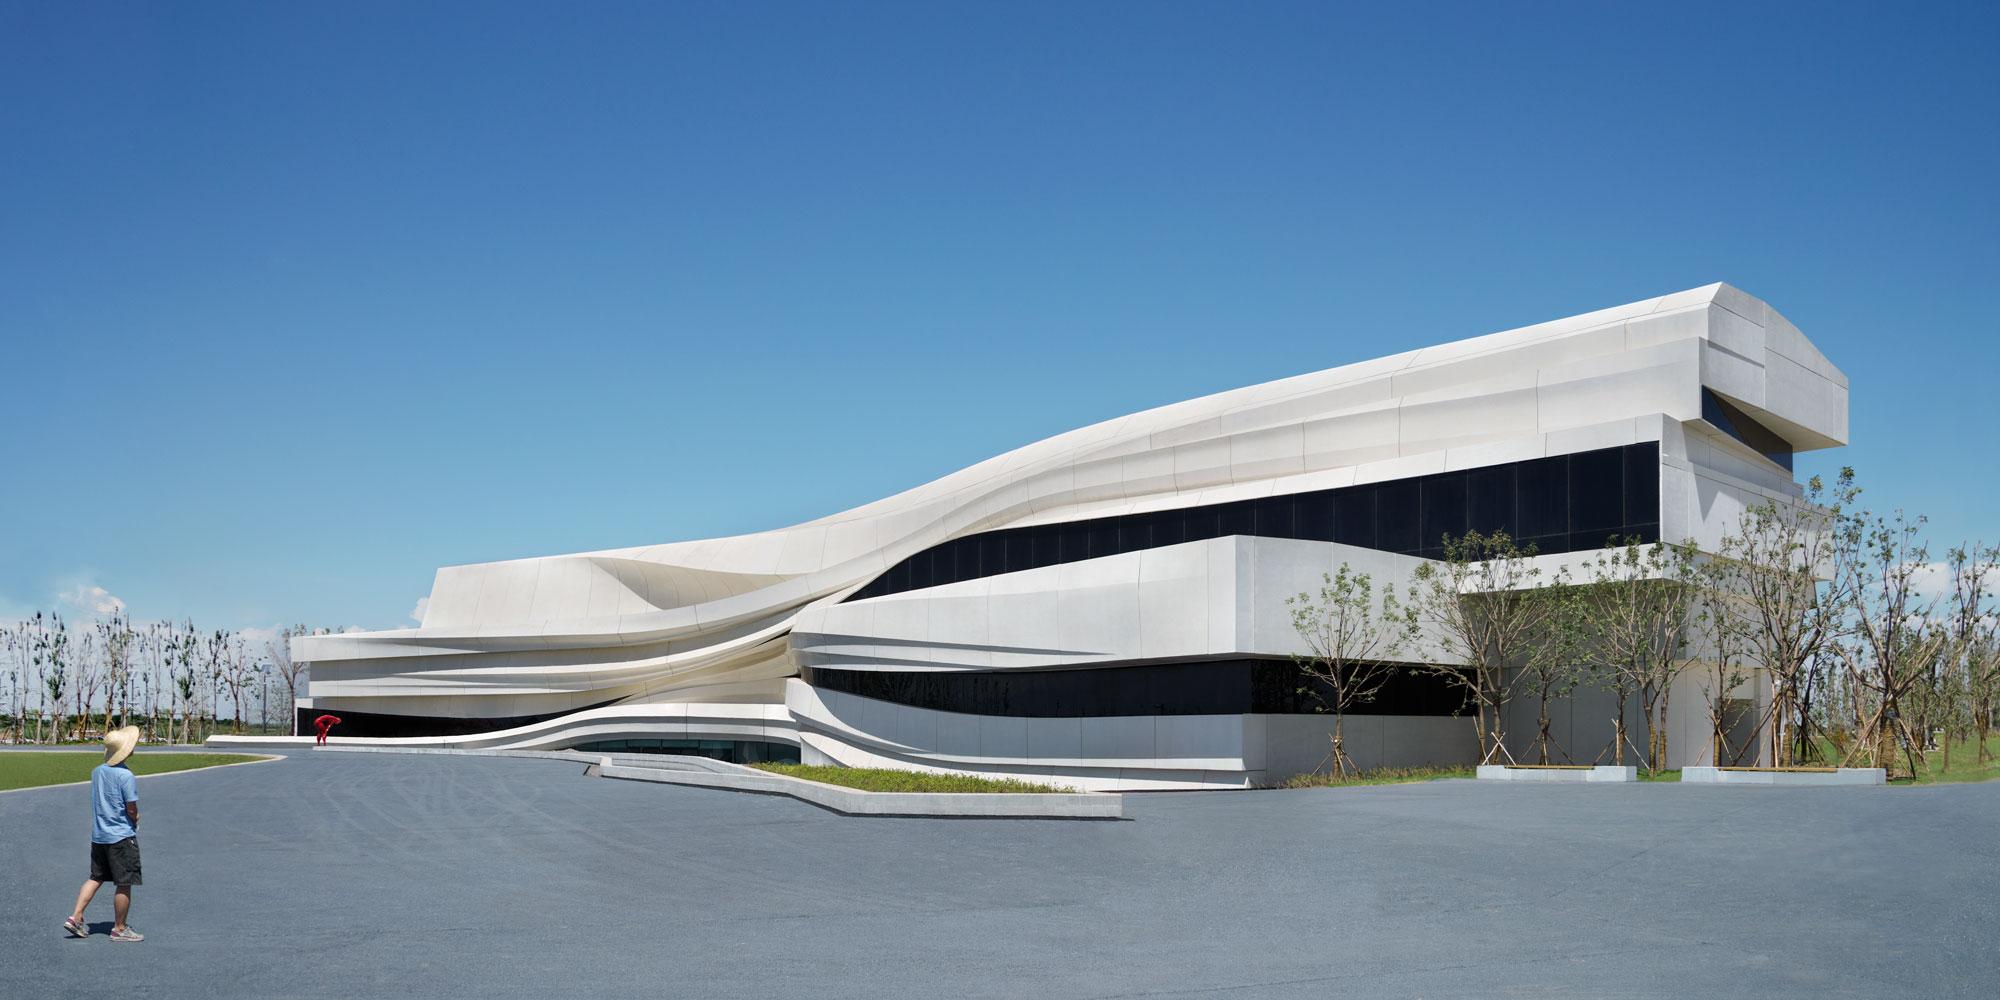 Moca Yinchuan Waa Architects Project